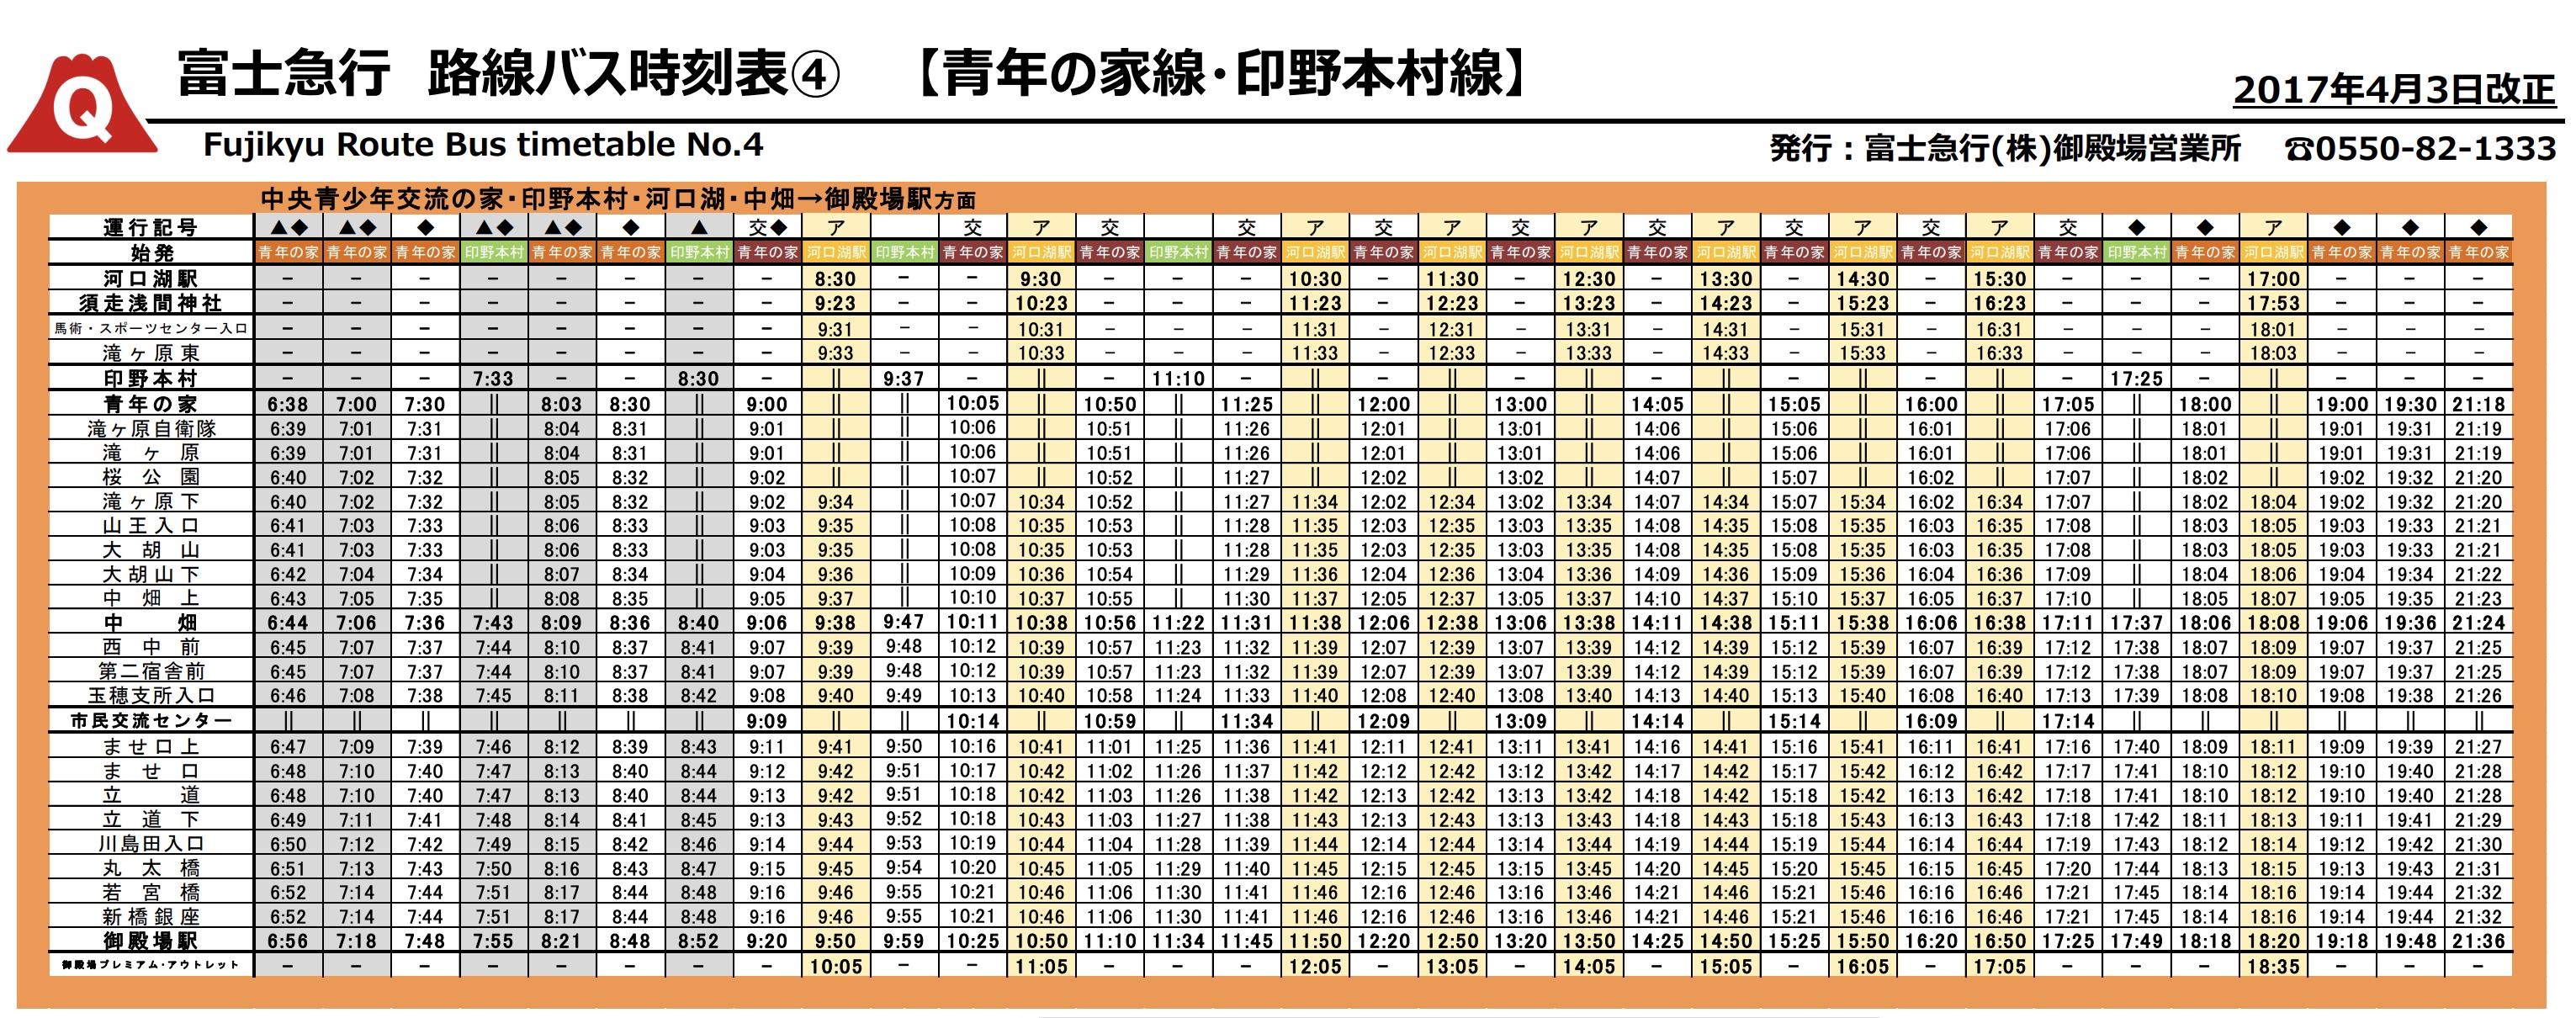 富士急バス時刻表